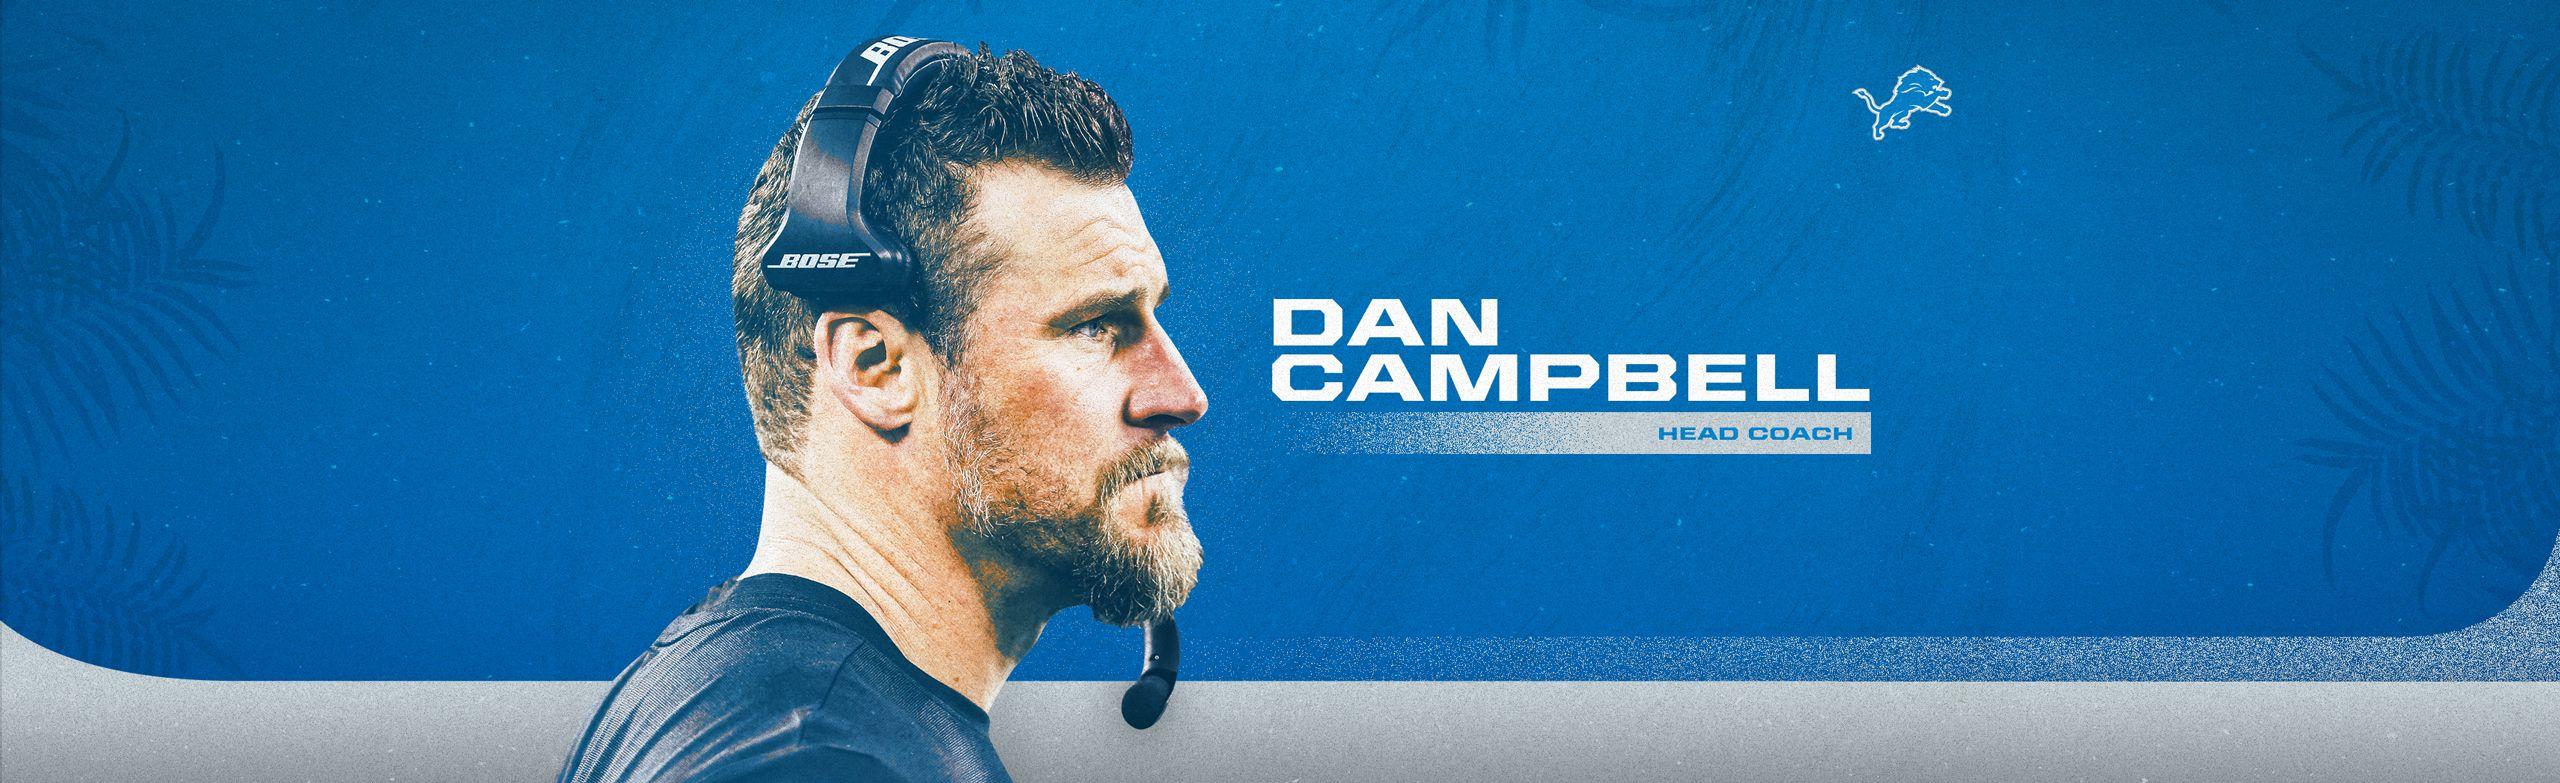 dan-campbell-header-final